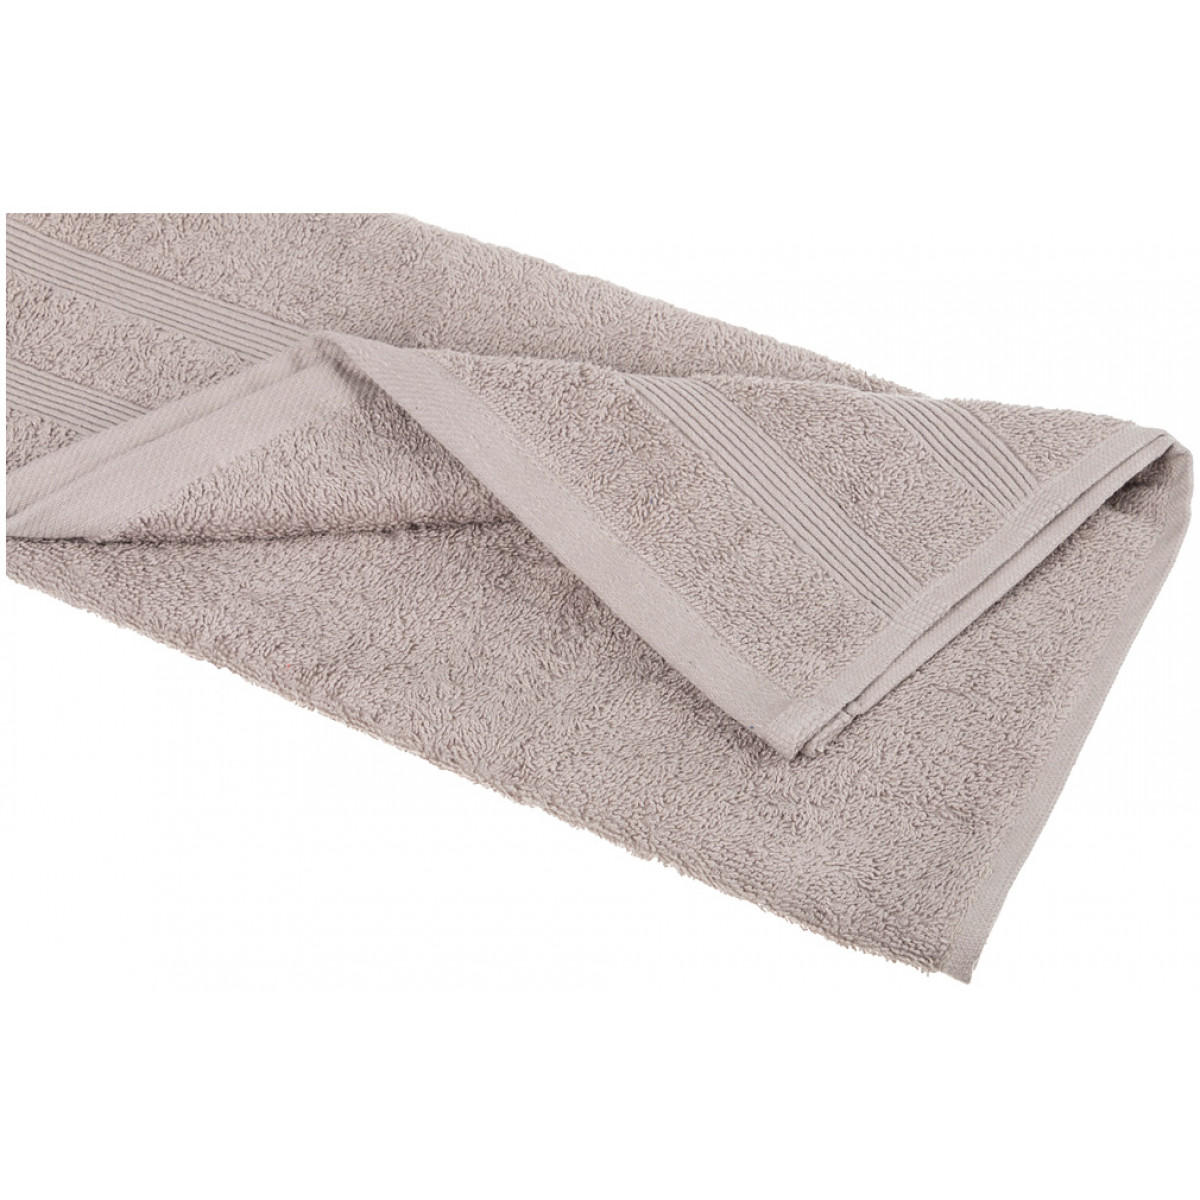 Полотенца Santalino Полотенце Makeda  (40х70 см) полотенца santalino полотенце shulamite 40х70 см